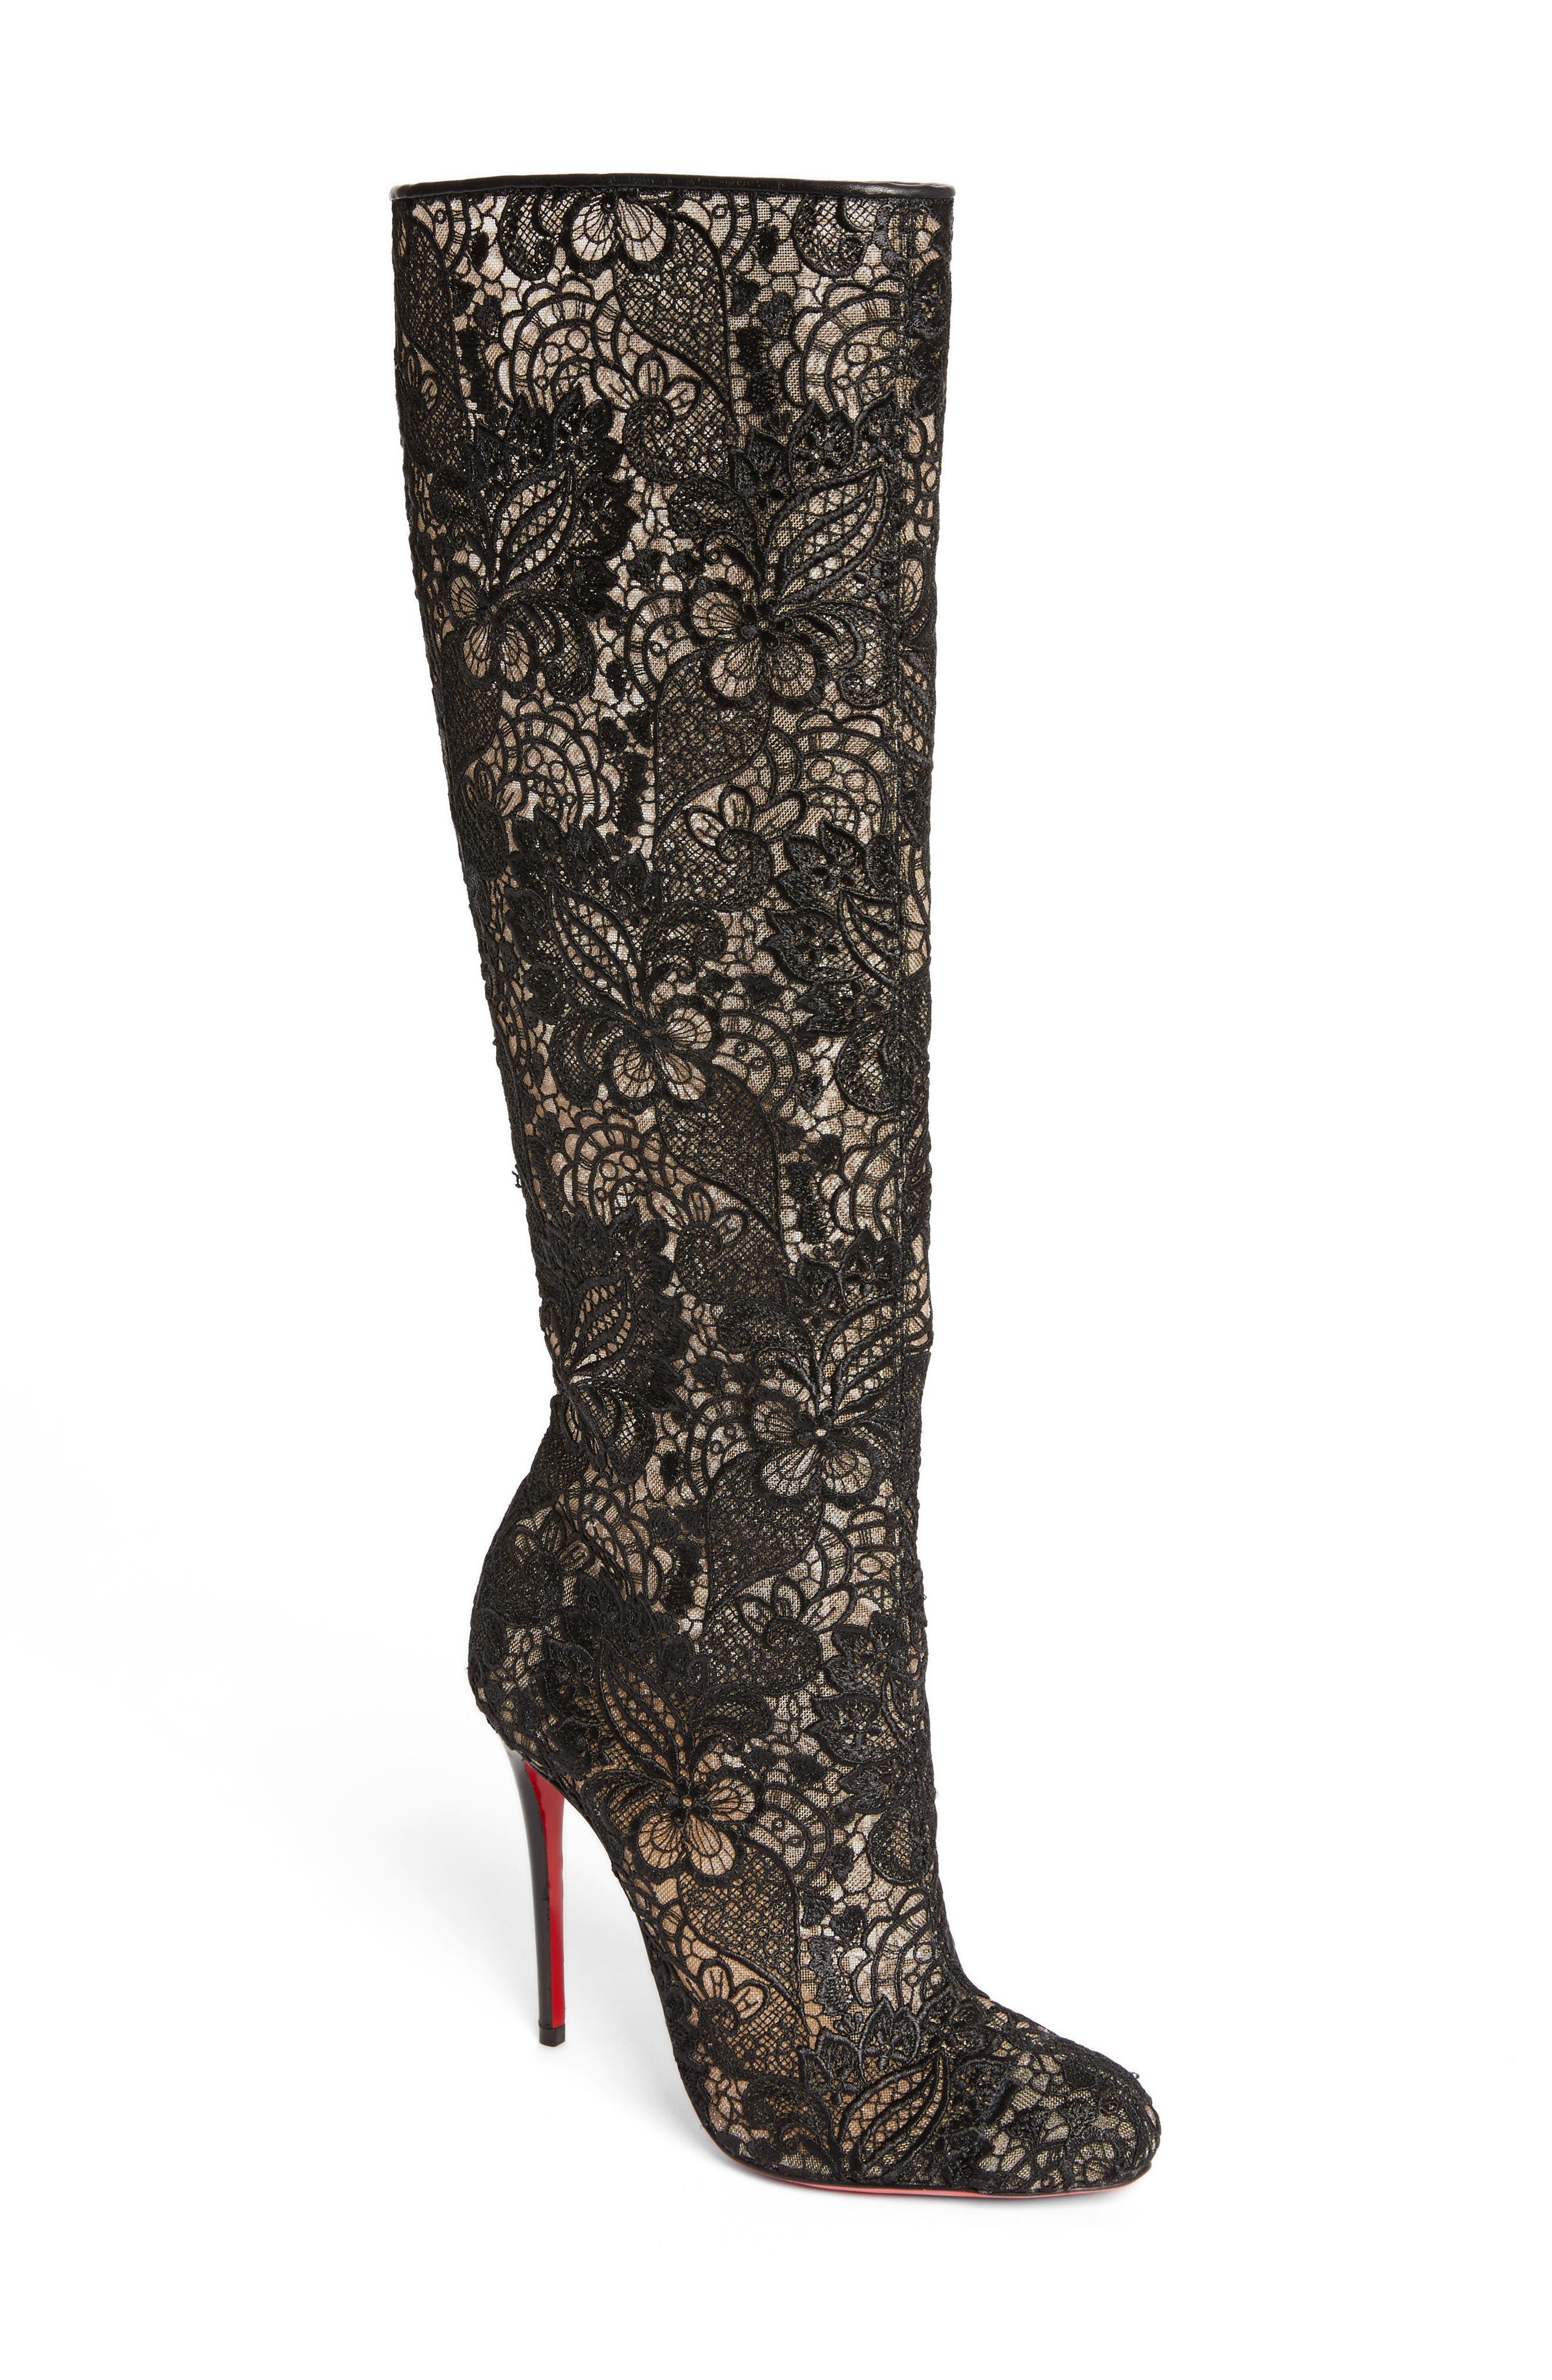 christian louboutin high heels boots